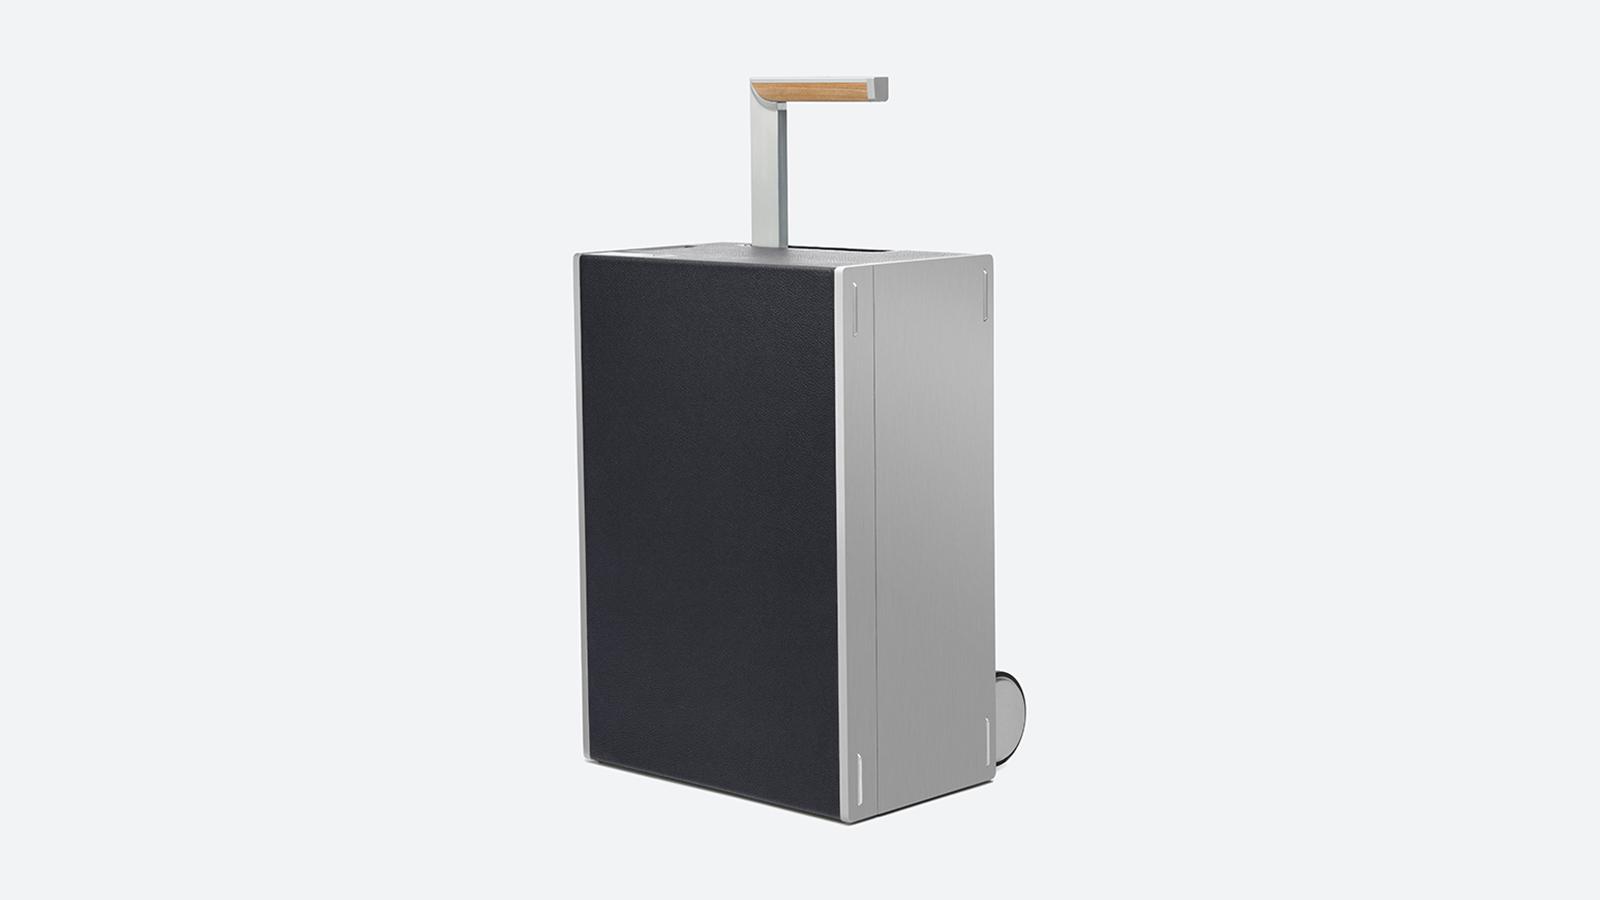 Charles Simon Bonaventure Aluminum Luggage